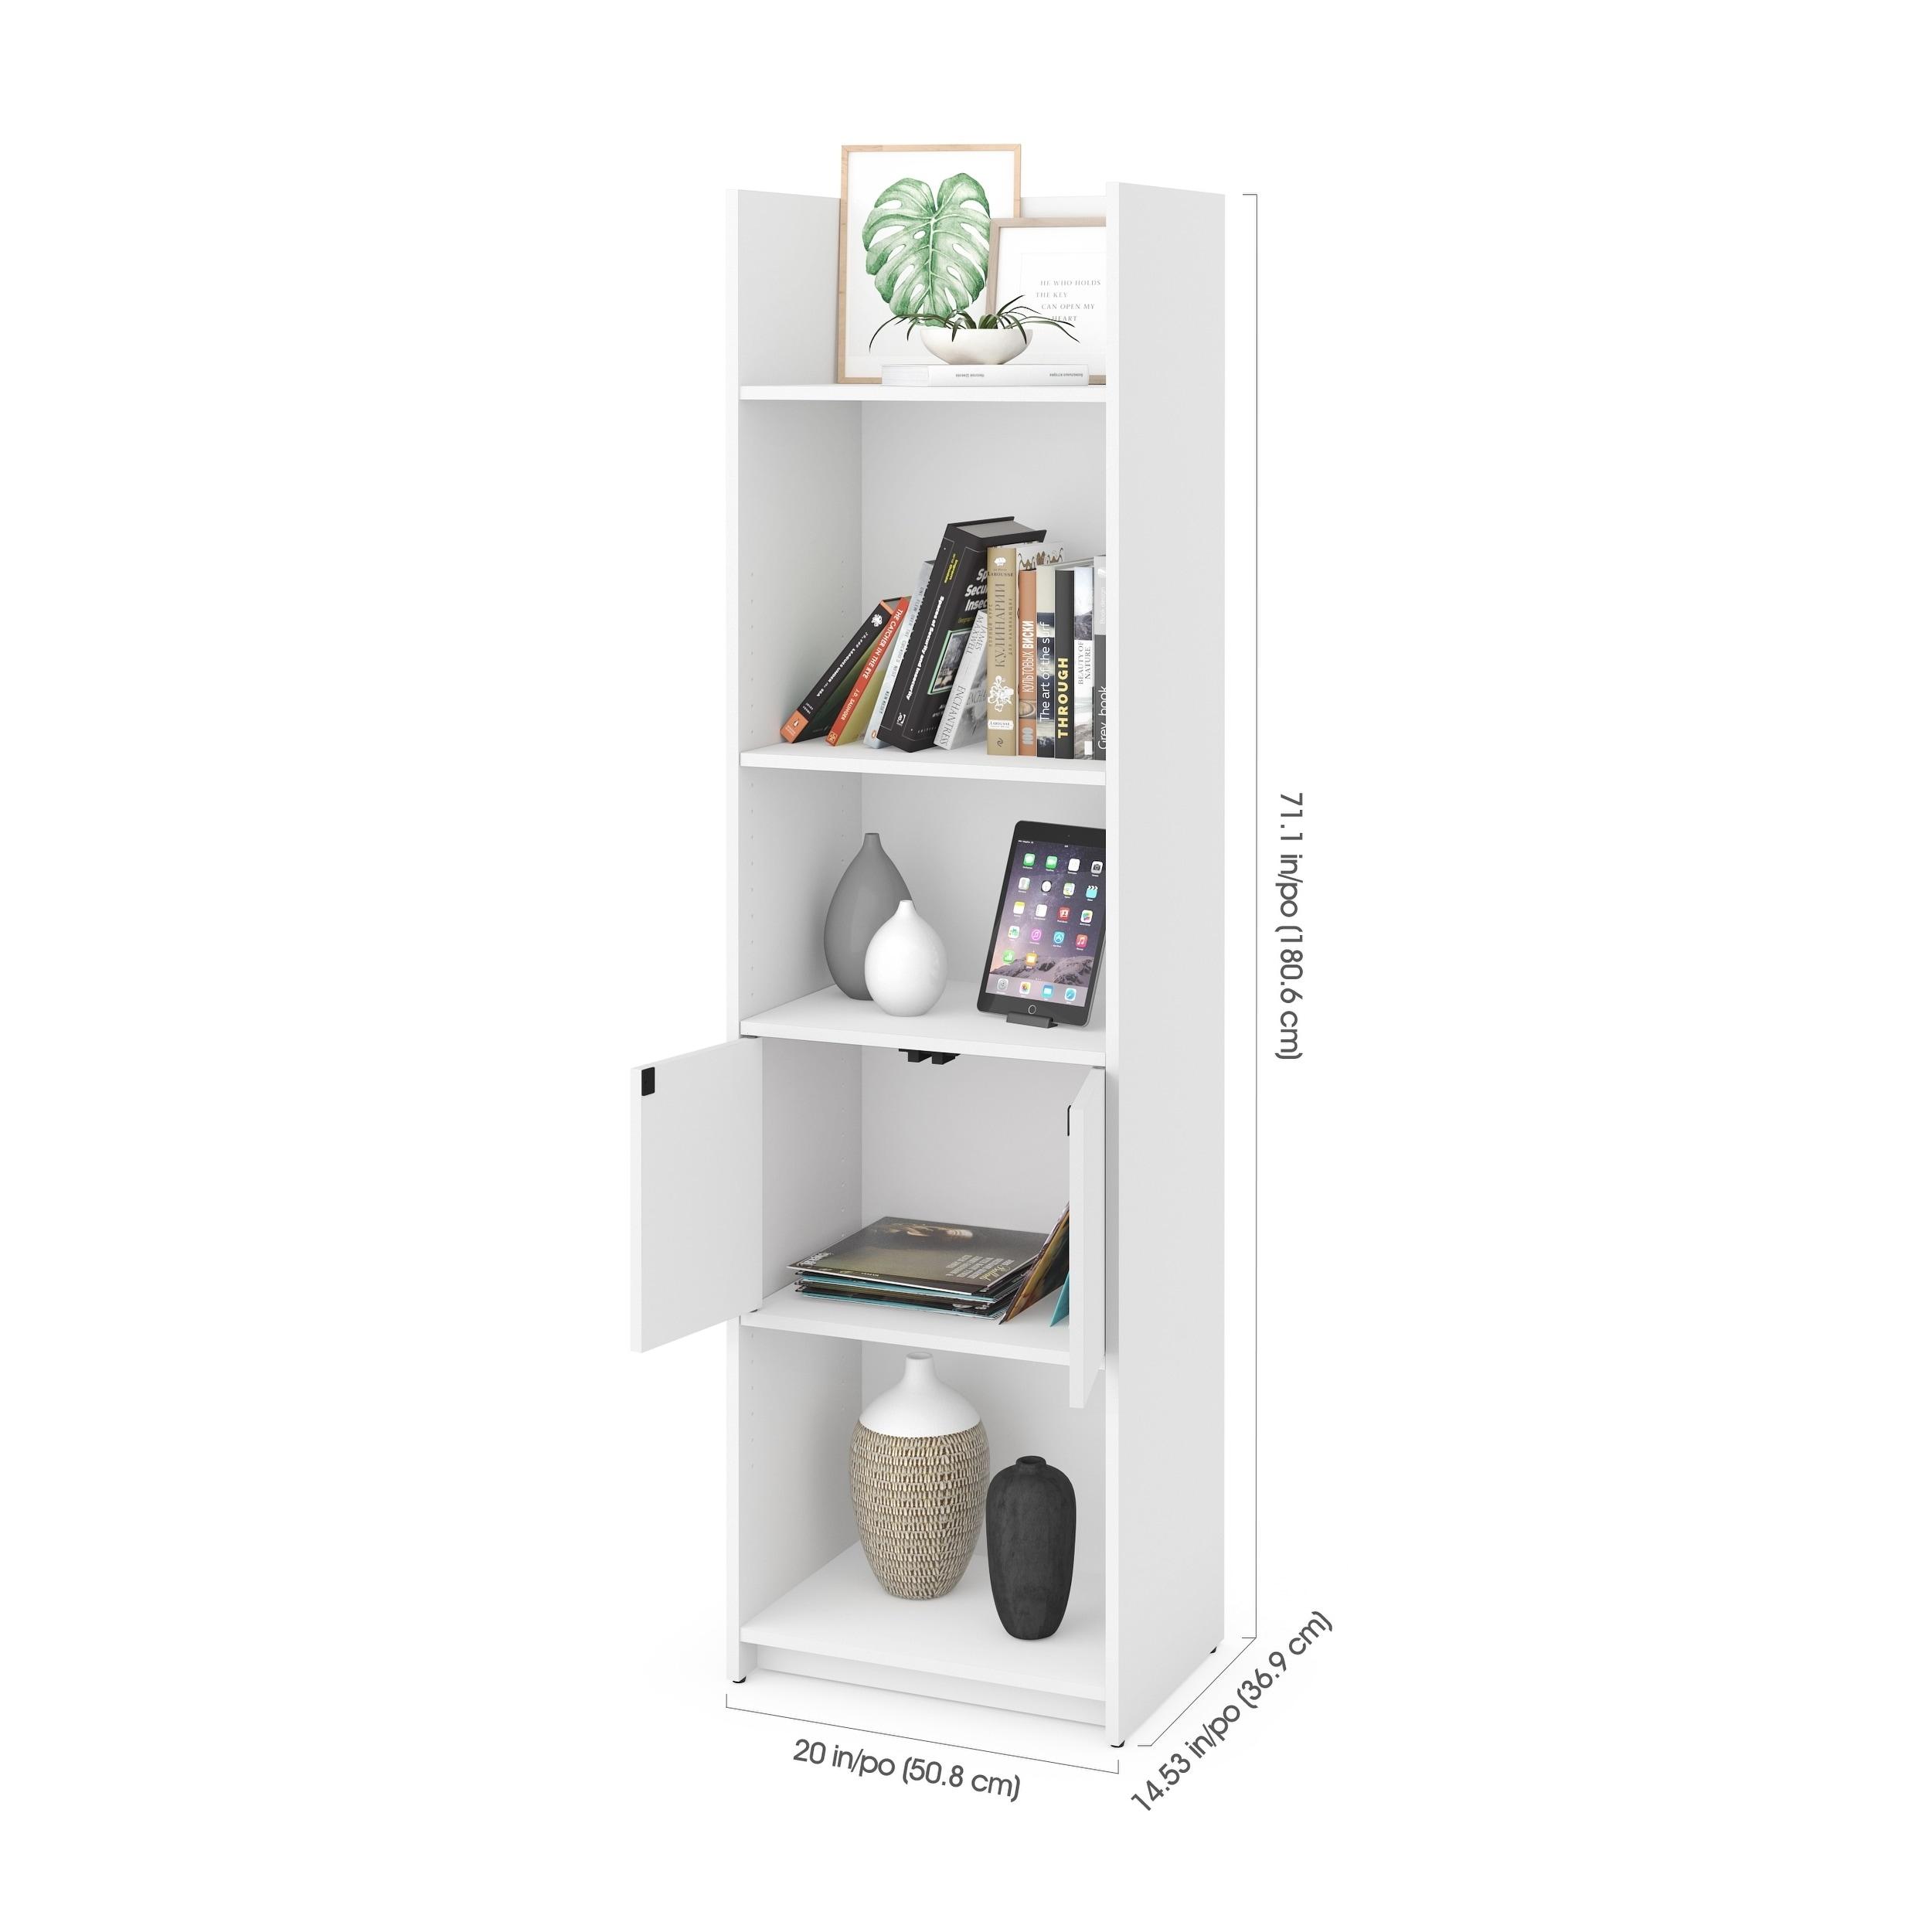 rack video stand itm display bookcases var westwood sentinel book game pb dvd bookcase shelf tower storage cd